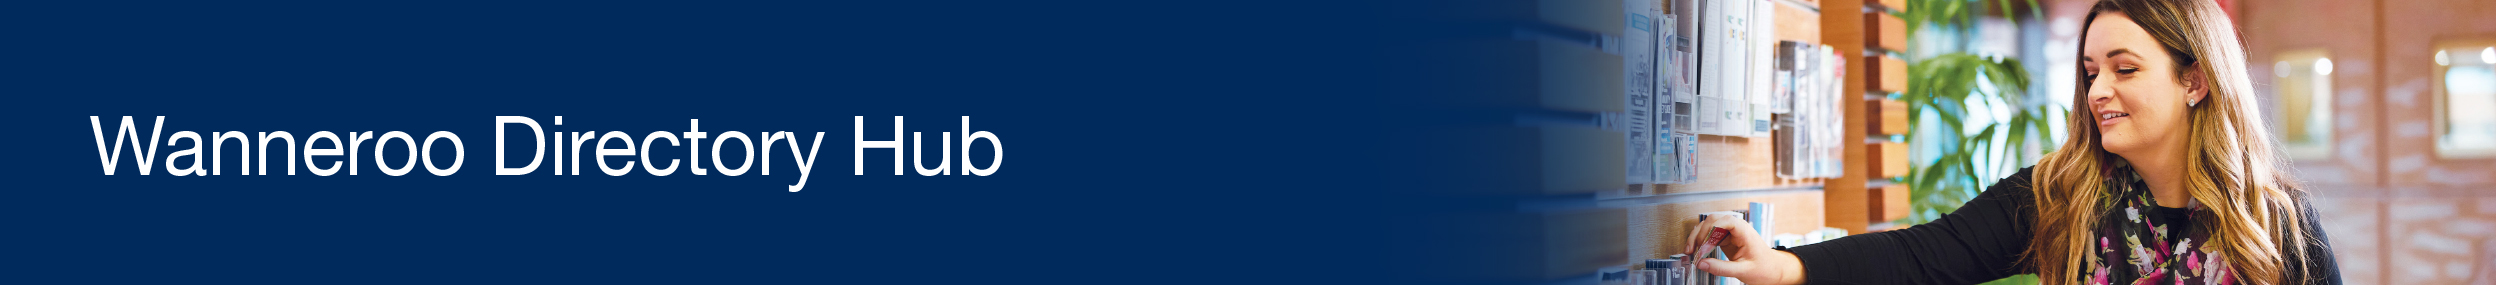 Directory hub image